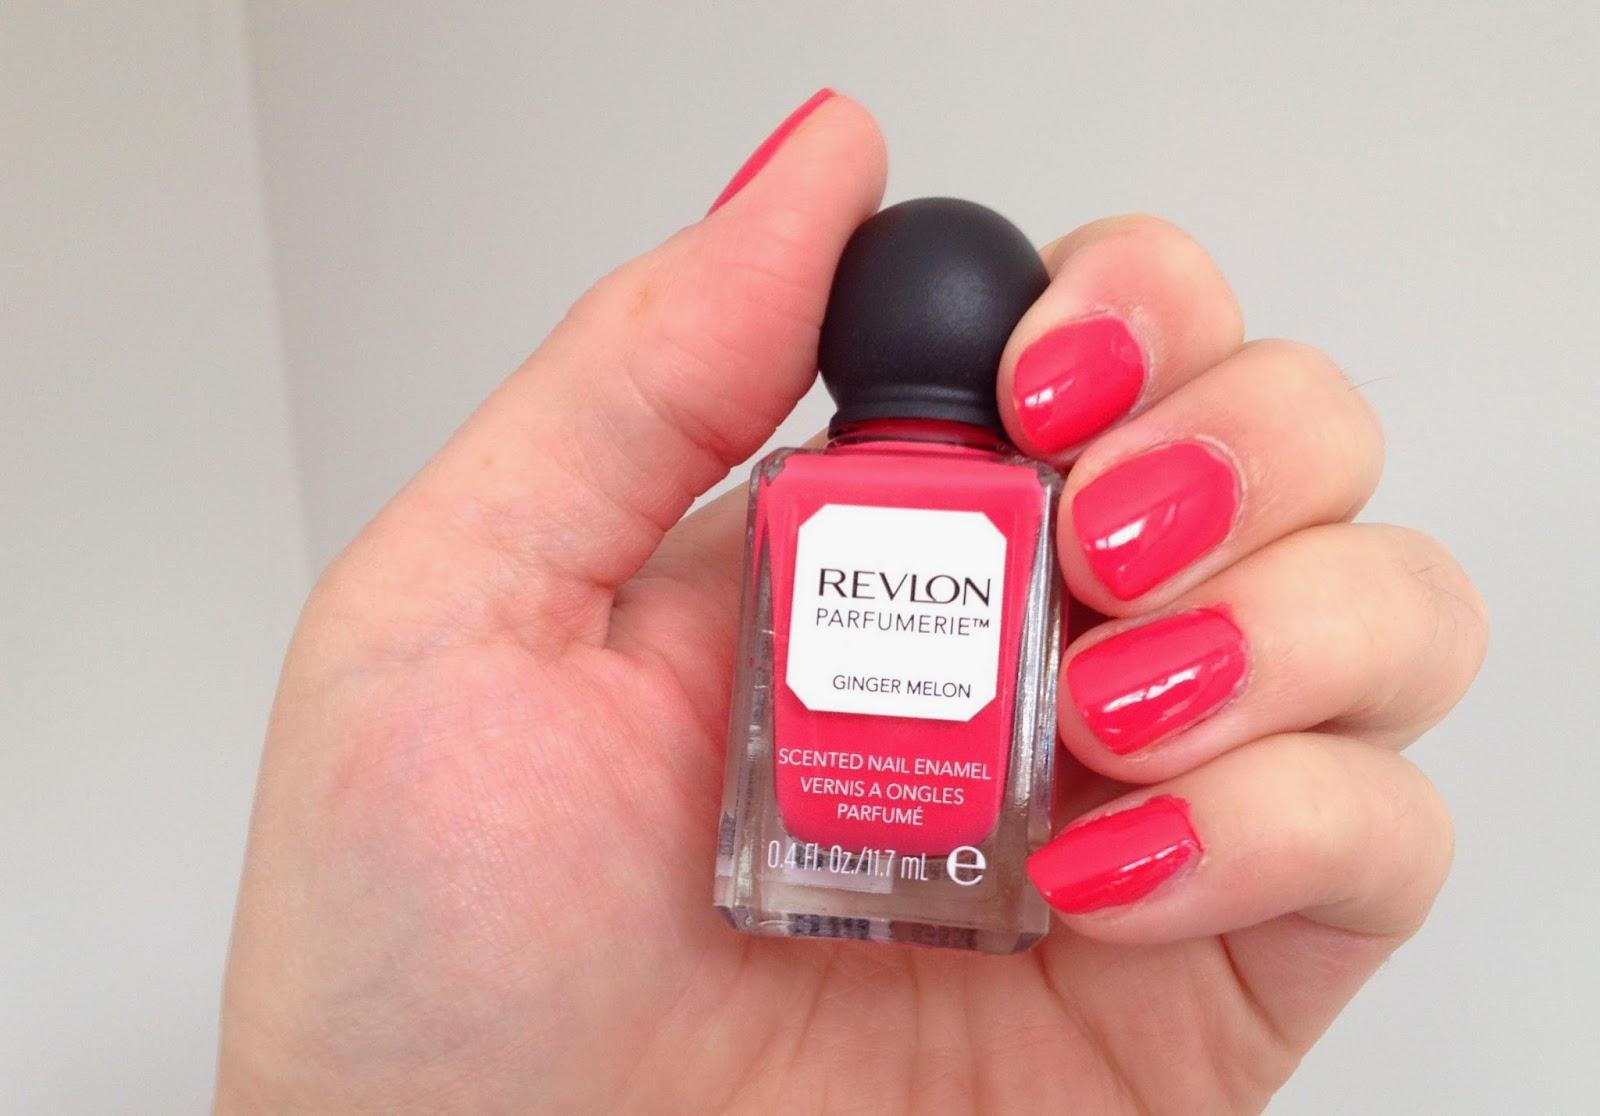 Revlon Parfumerie scented nail polish Ginger Melon